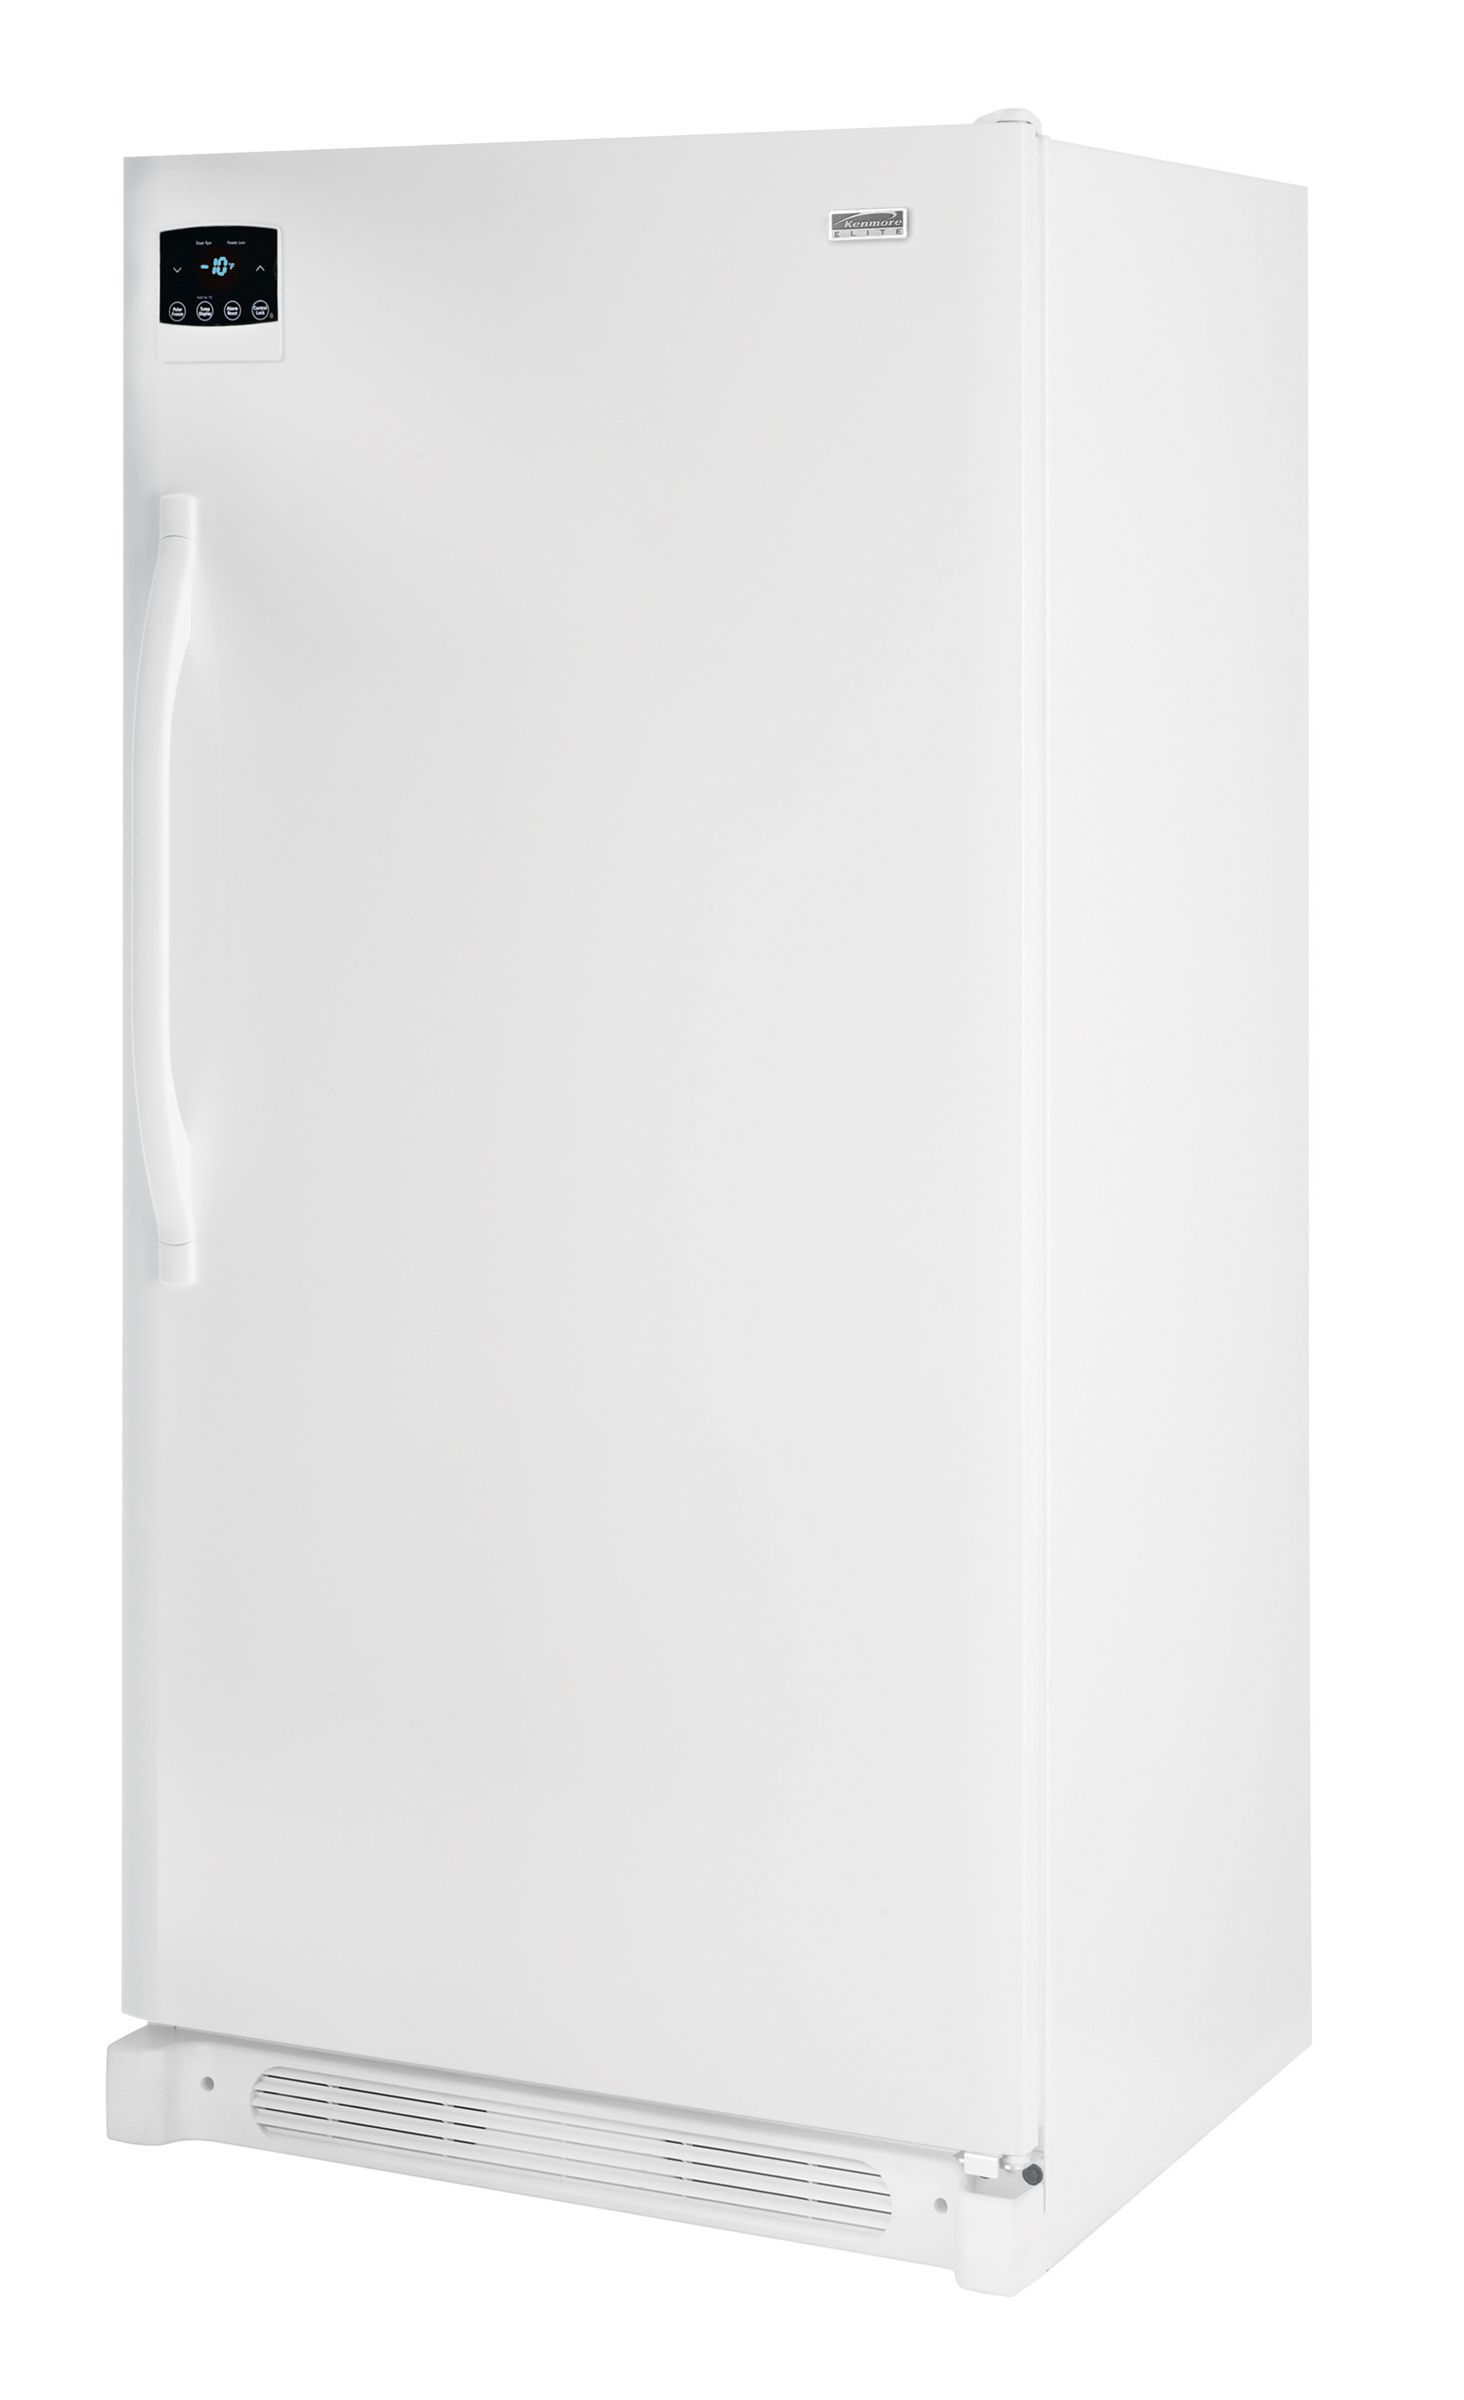 Kenmore Elite 16.7 cu. ft. Upright Freezer